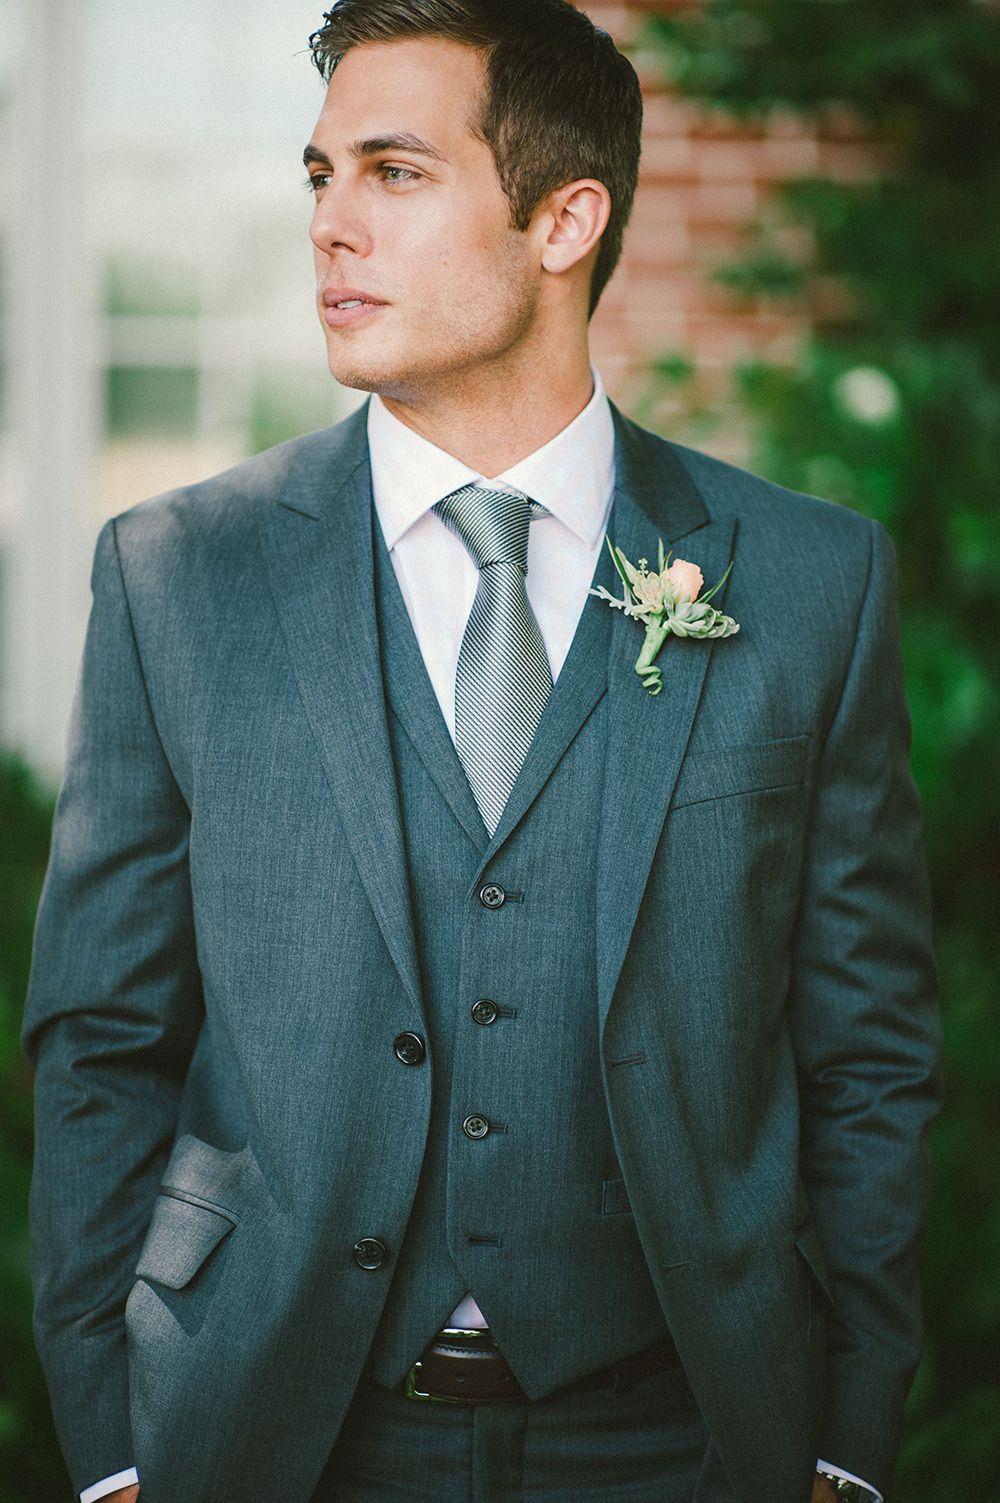 Photography: Emily Blake Photography - emilyblakephoto.com  Read More: http://www.stylemepretty.com/2014/03/17/colorful-vineyard-wedding-in-lodi-california/